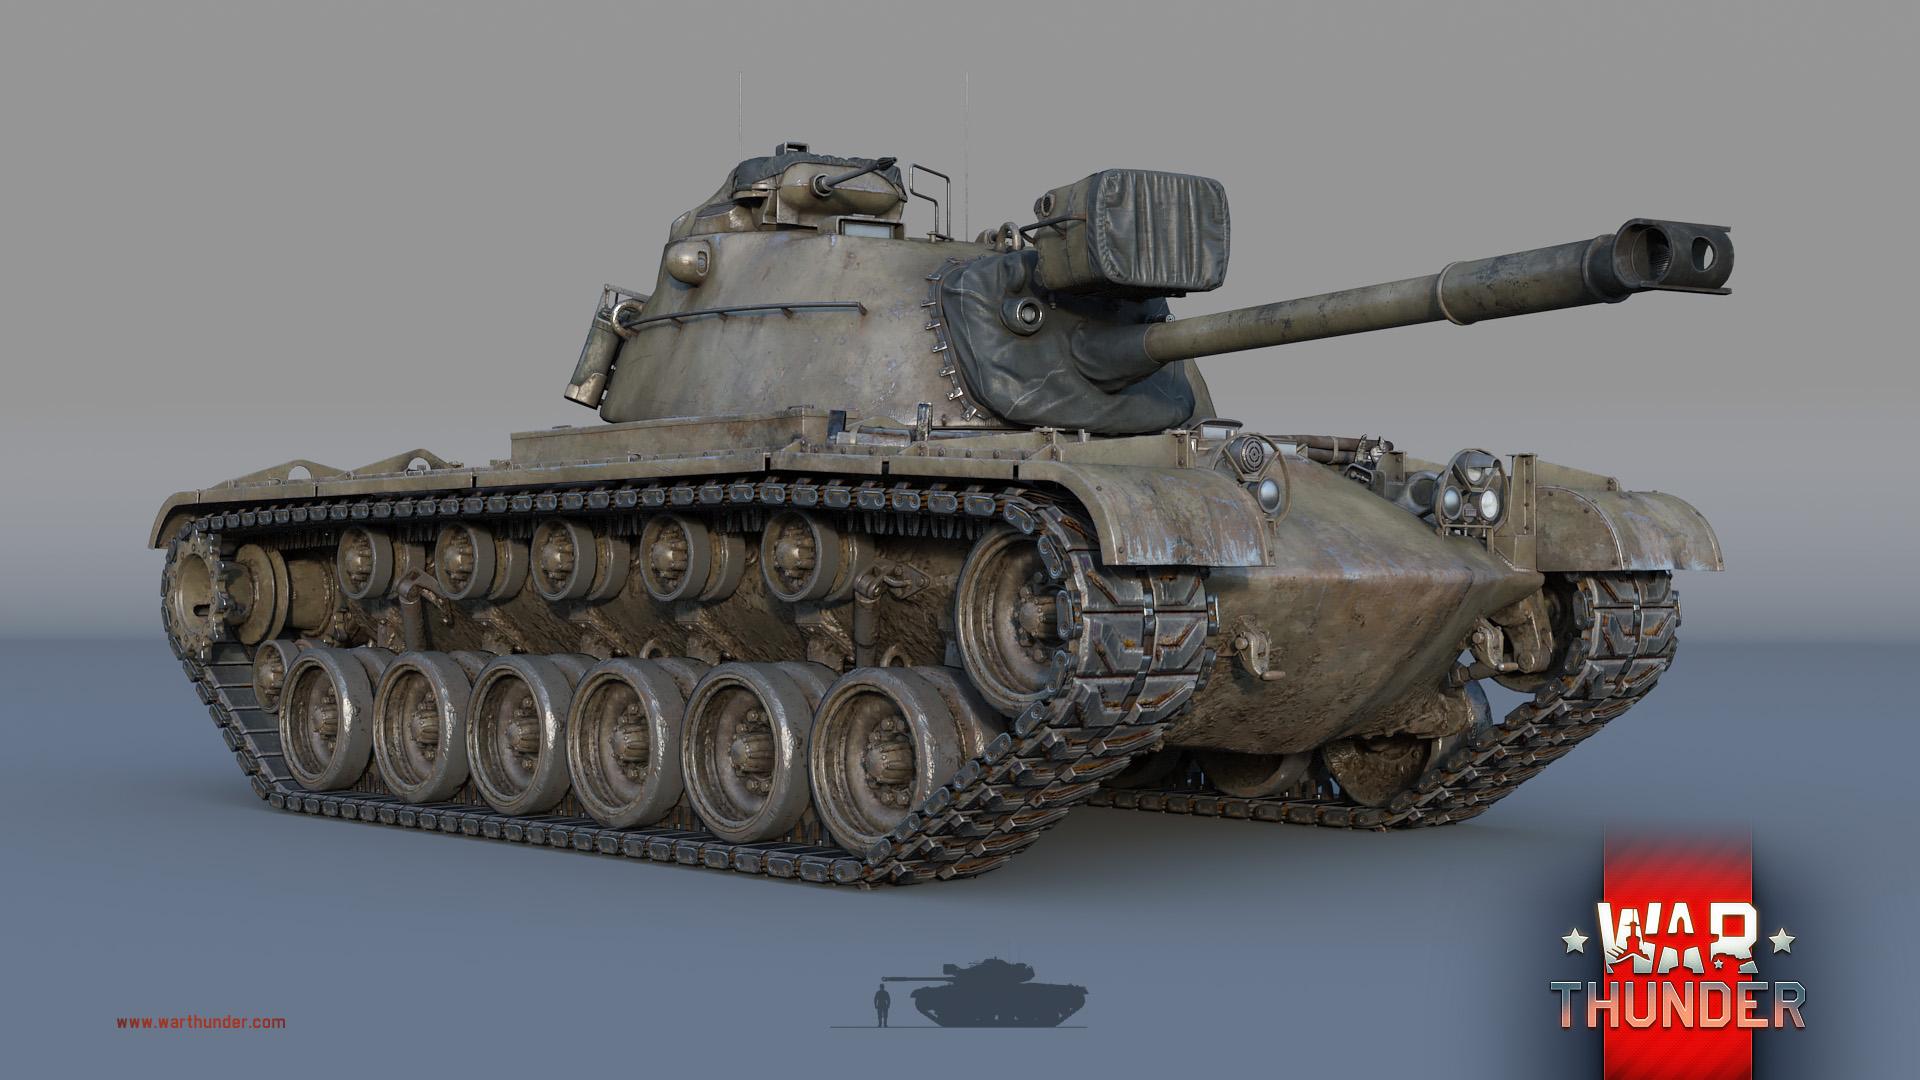 Welt der Panzer kv1 Matchmaking